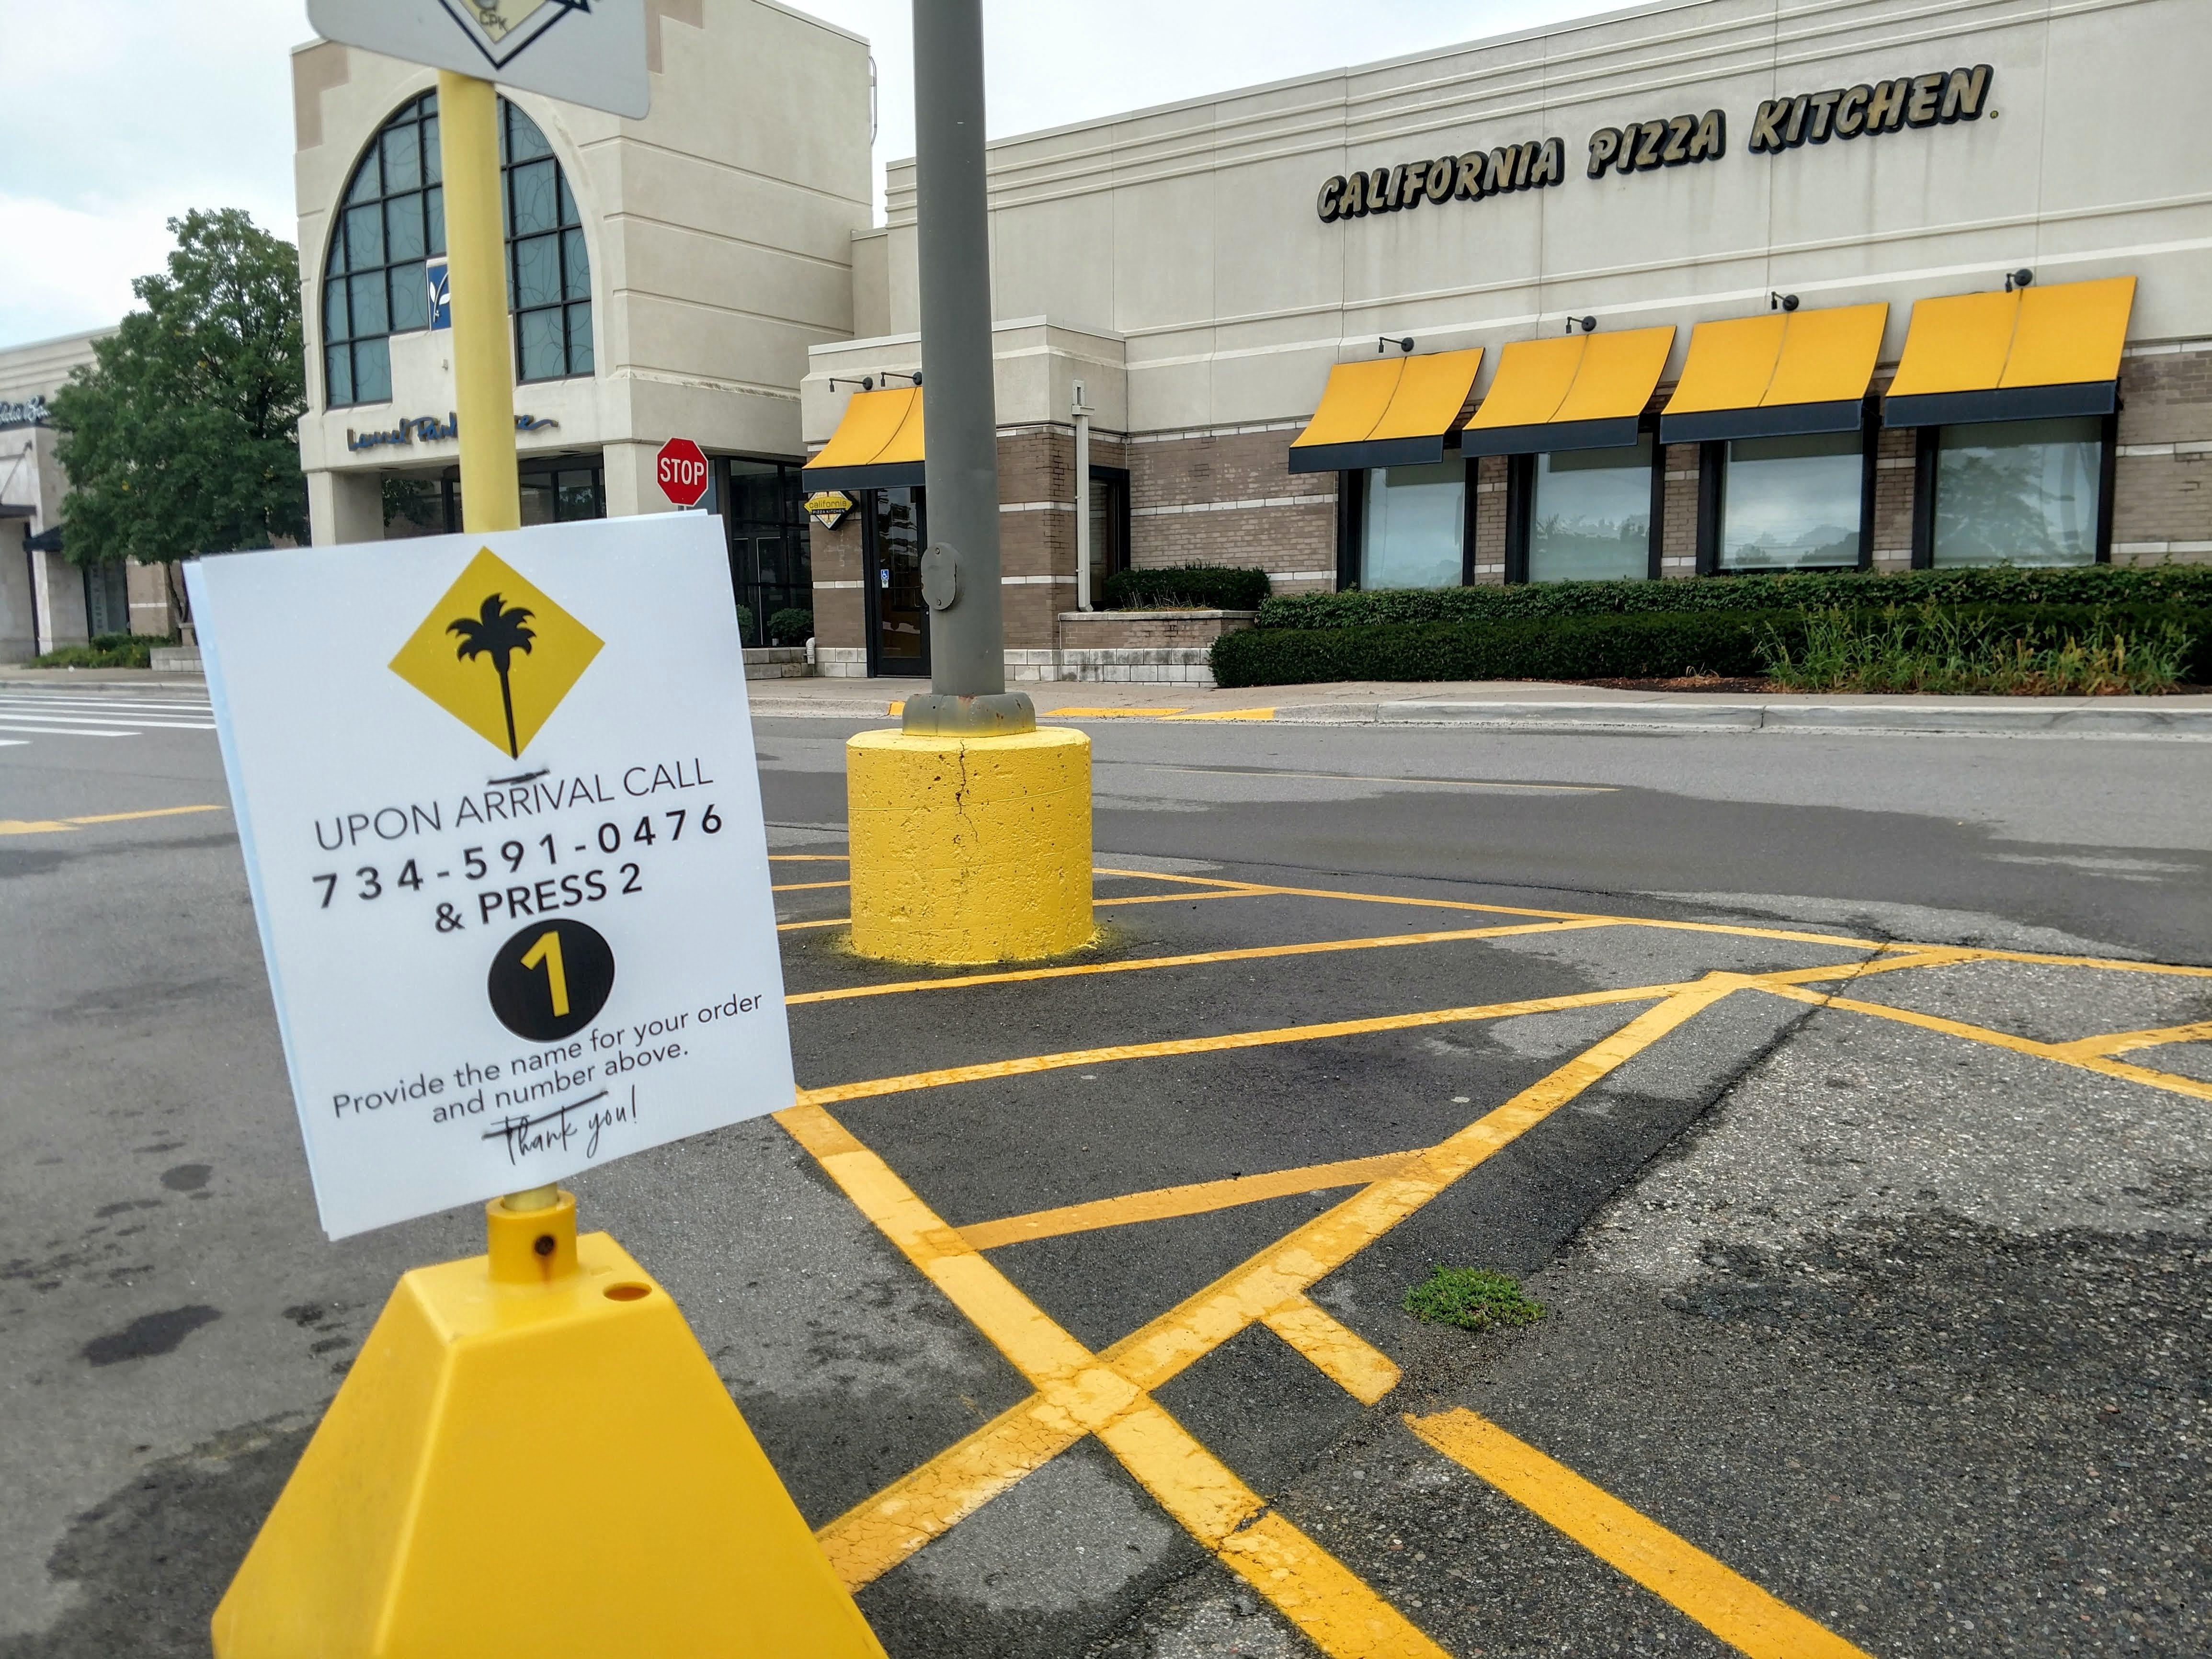 California Pizza Kitchen Closes Restaurants In Livonia Farmington Hills